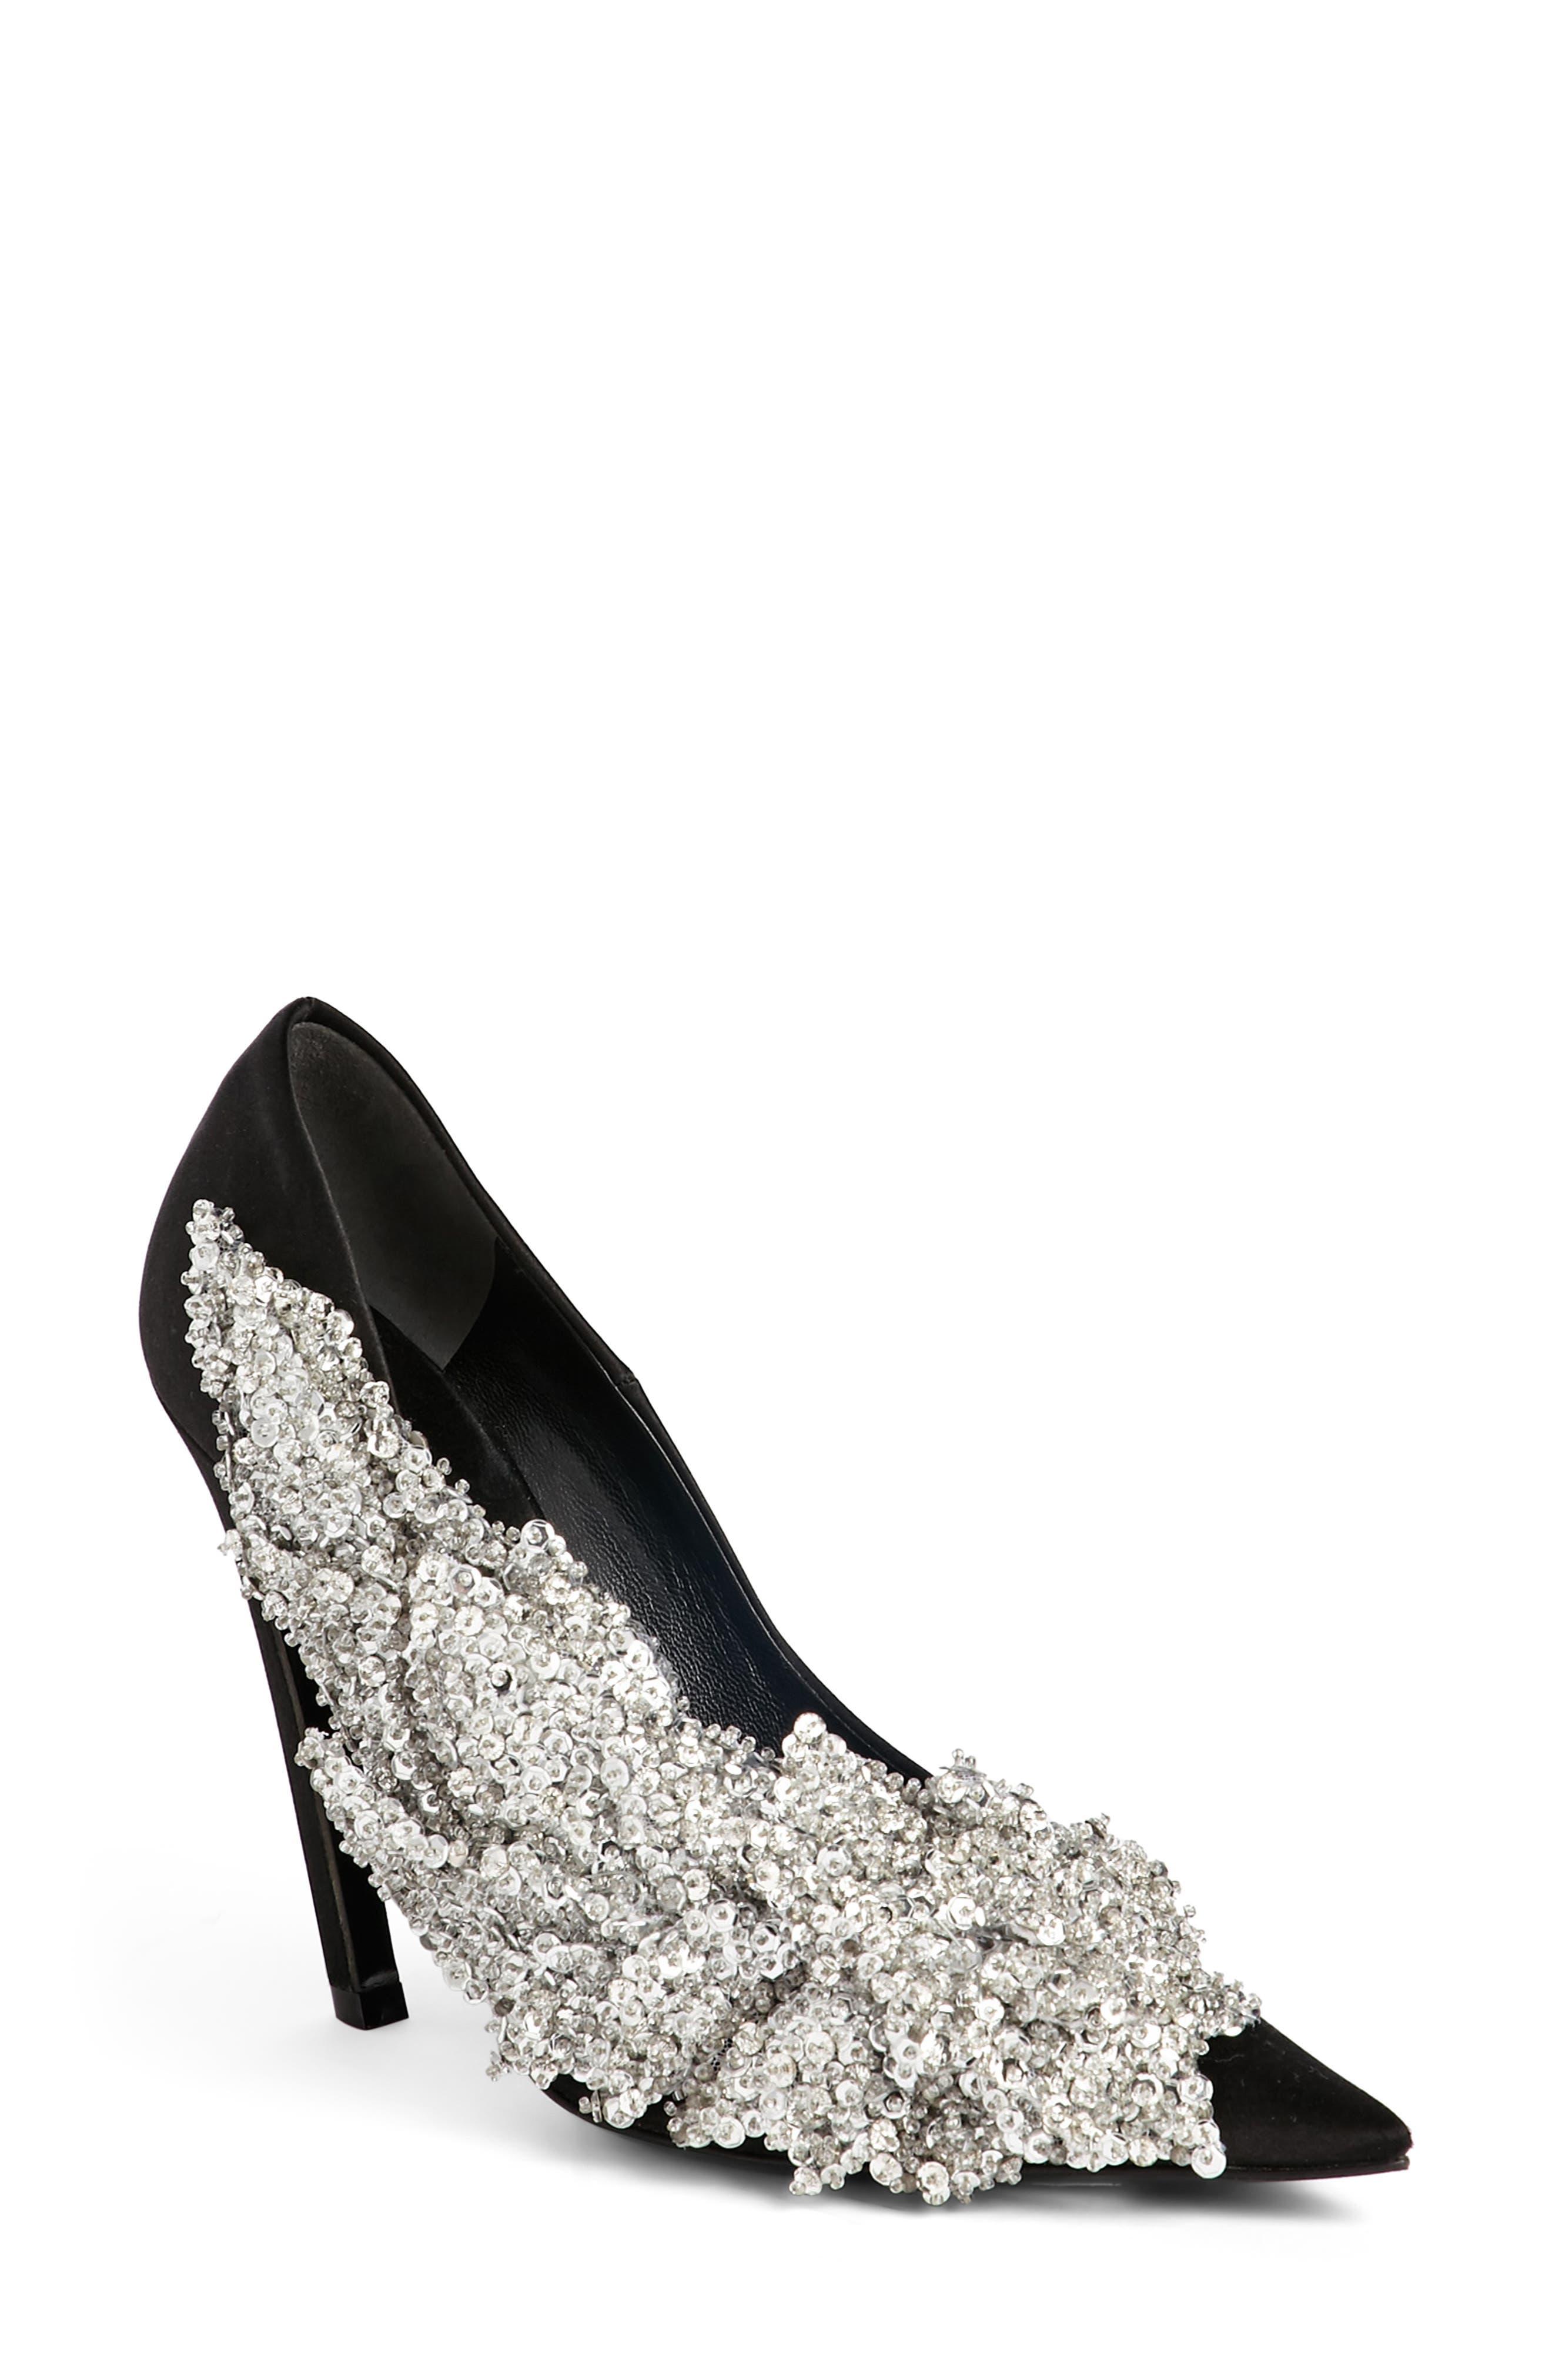 Alternate Image 1 Selected - Balenciaga Embellished Pointy Toe Pump (Women)